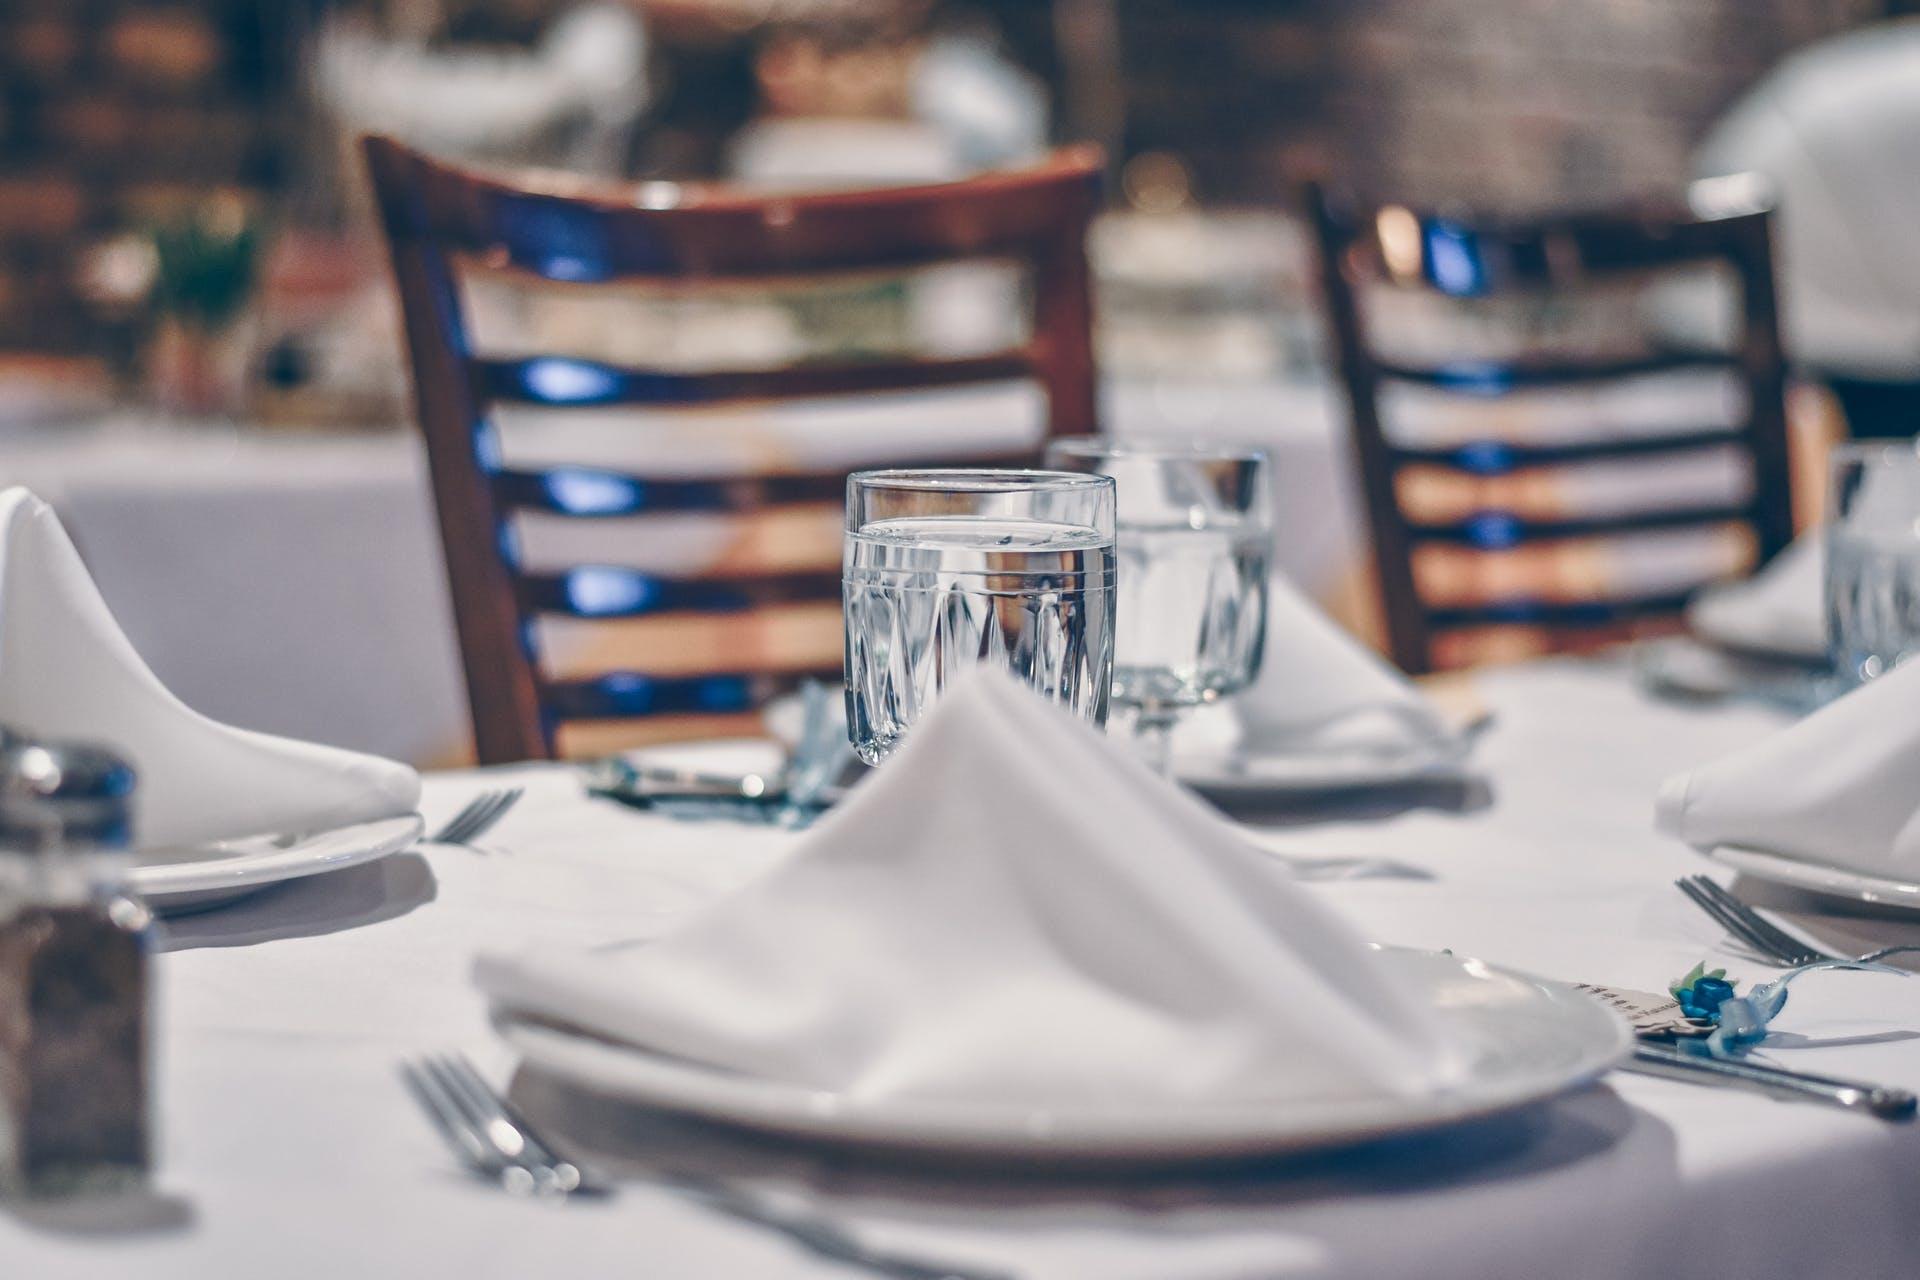 silverware new york napkin beverage room dining indoors clear food modern